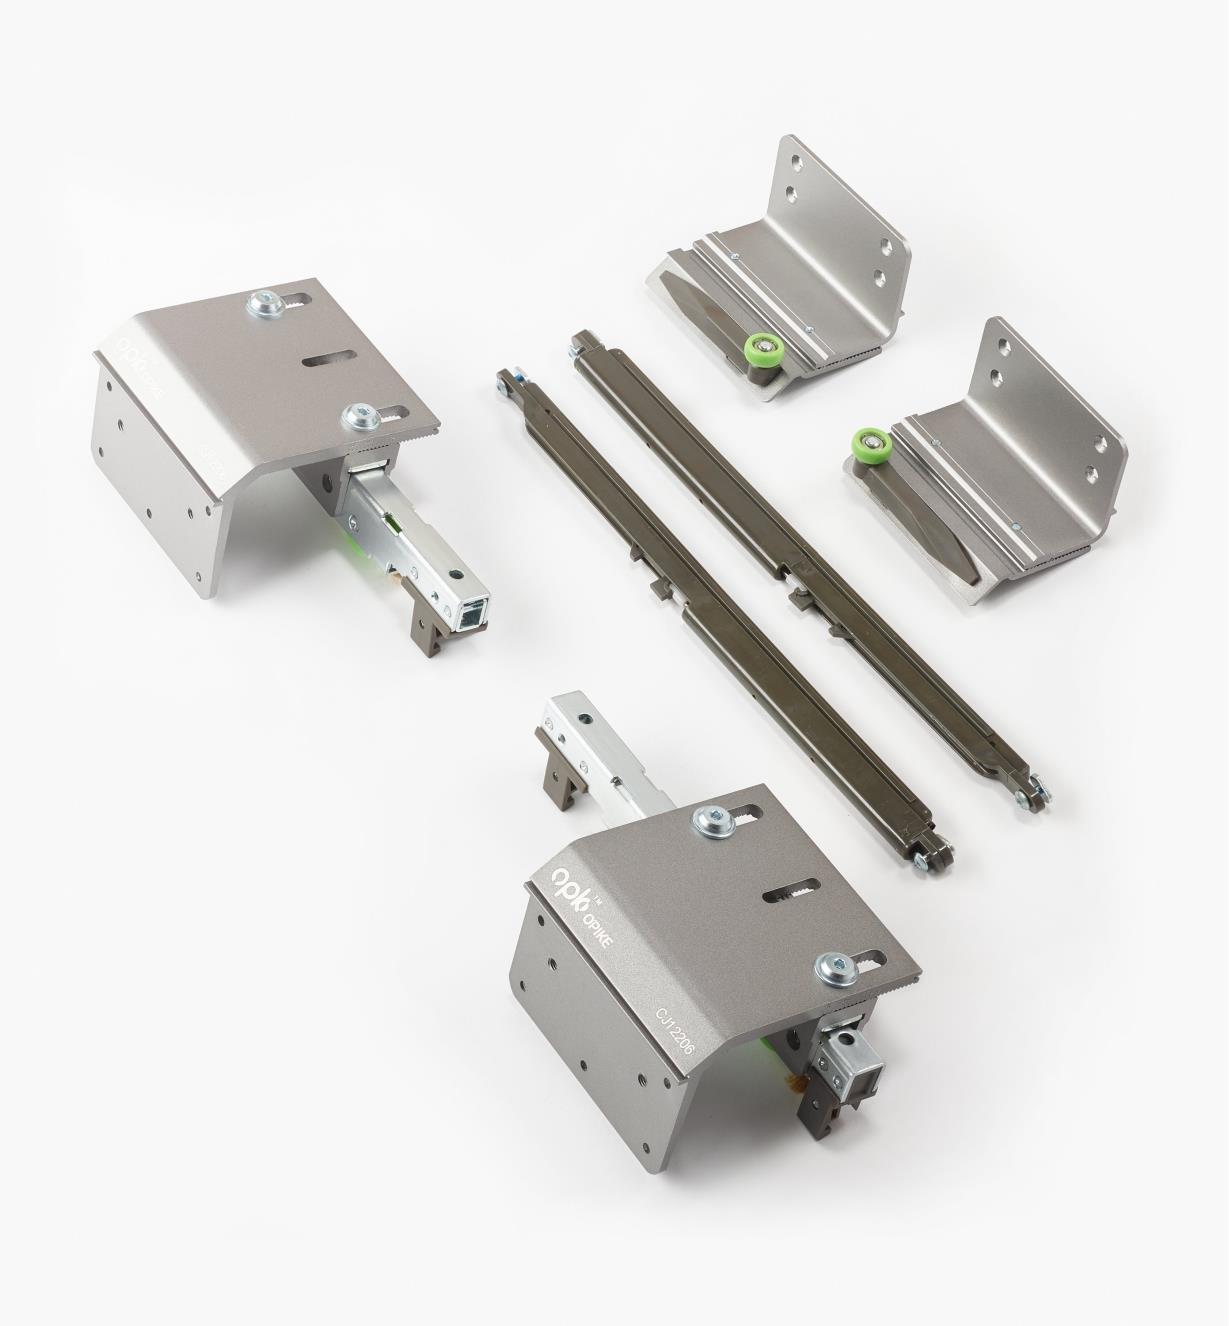 00B1135 - Overlay Bypass Sliding Door Hardware, Outer Door Hardware